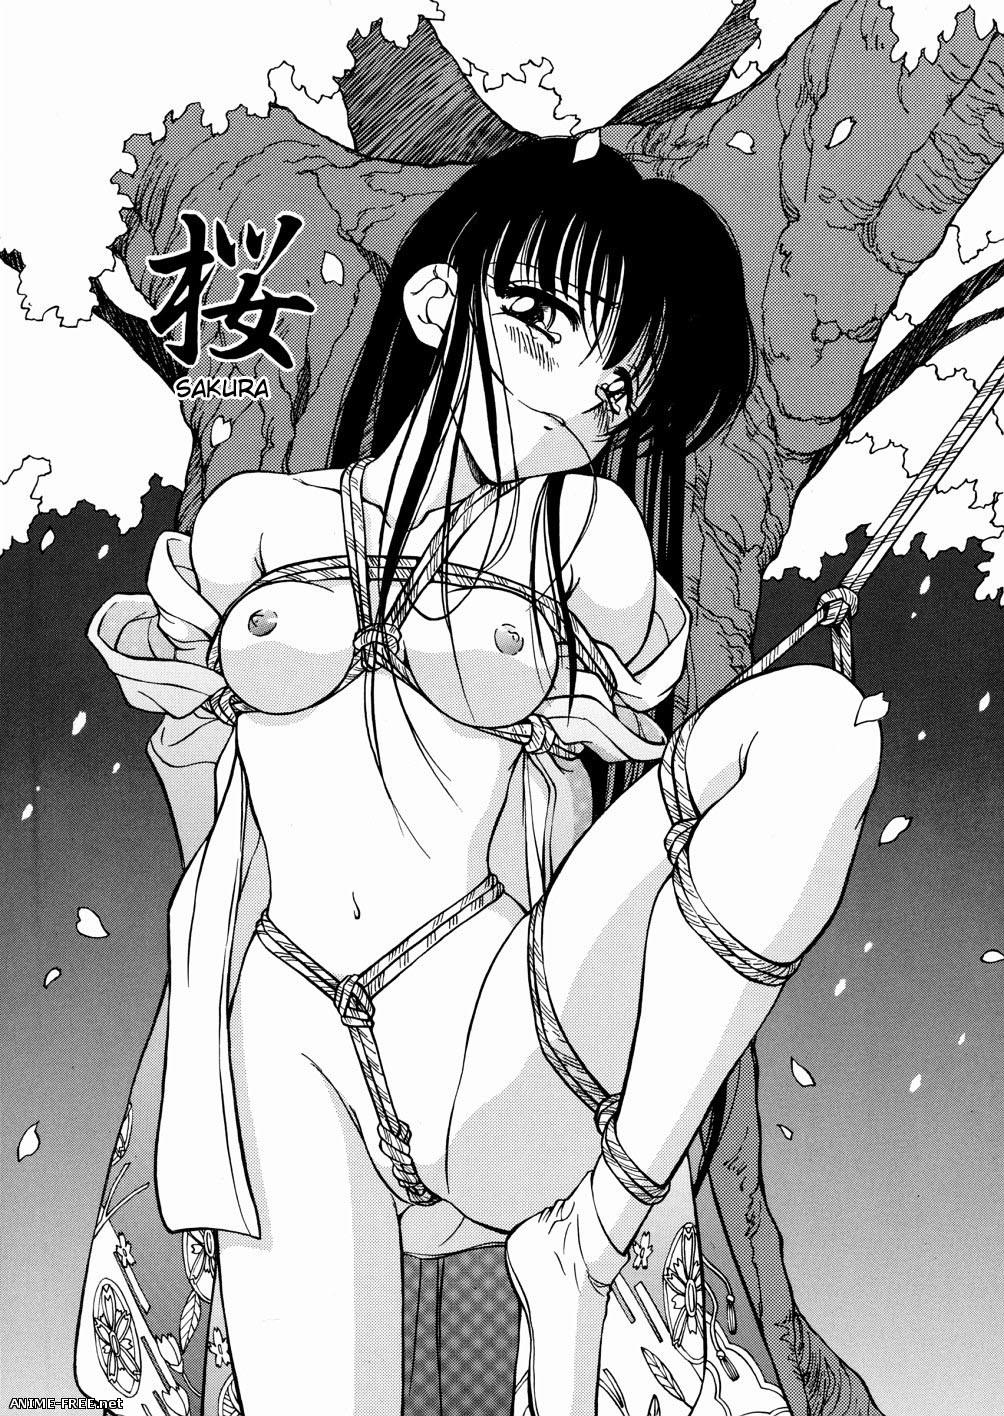 Spark Utamaro - Манга Коллекция [PtCen] [RUS,ENG,JAP] Manga Hentai